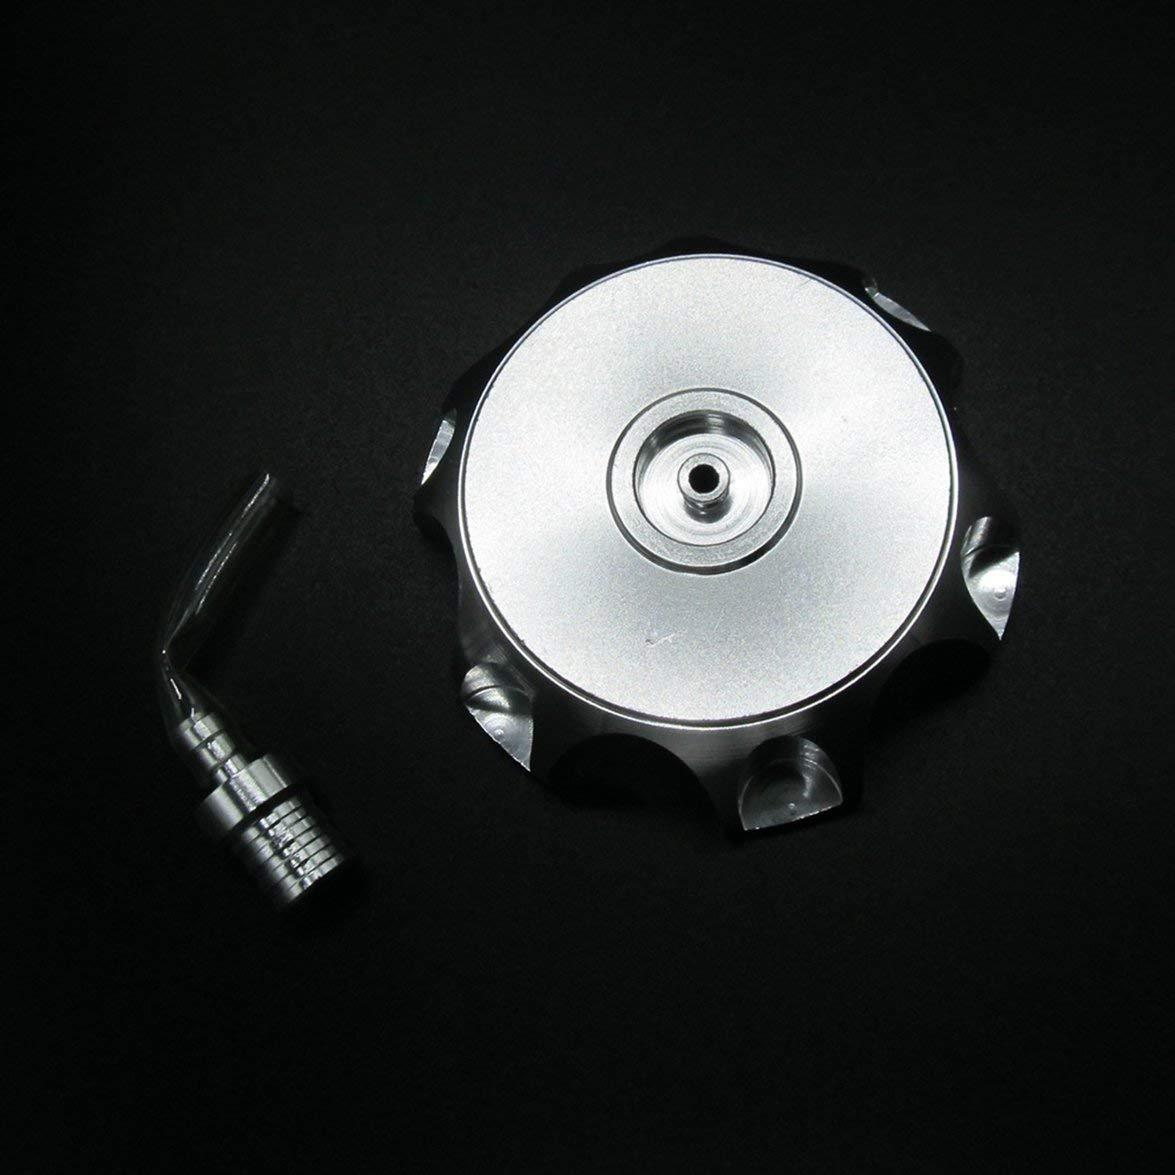 Kongqiabona Bouchon de r/éservoir de Carburant avec Tuba Cross-Country Moto modifi/ée Bouchon en Alliage daluminium Hexagonal